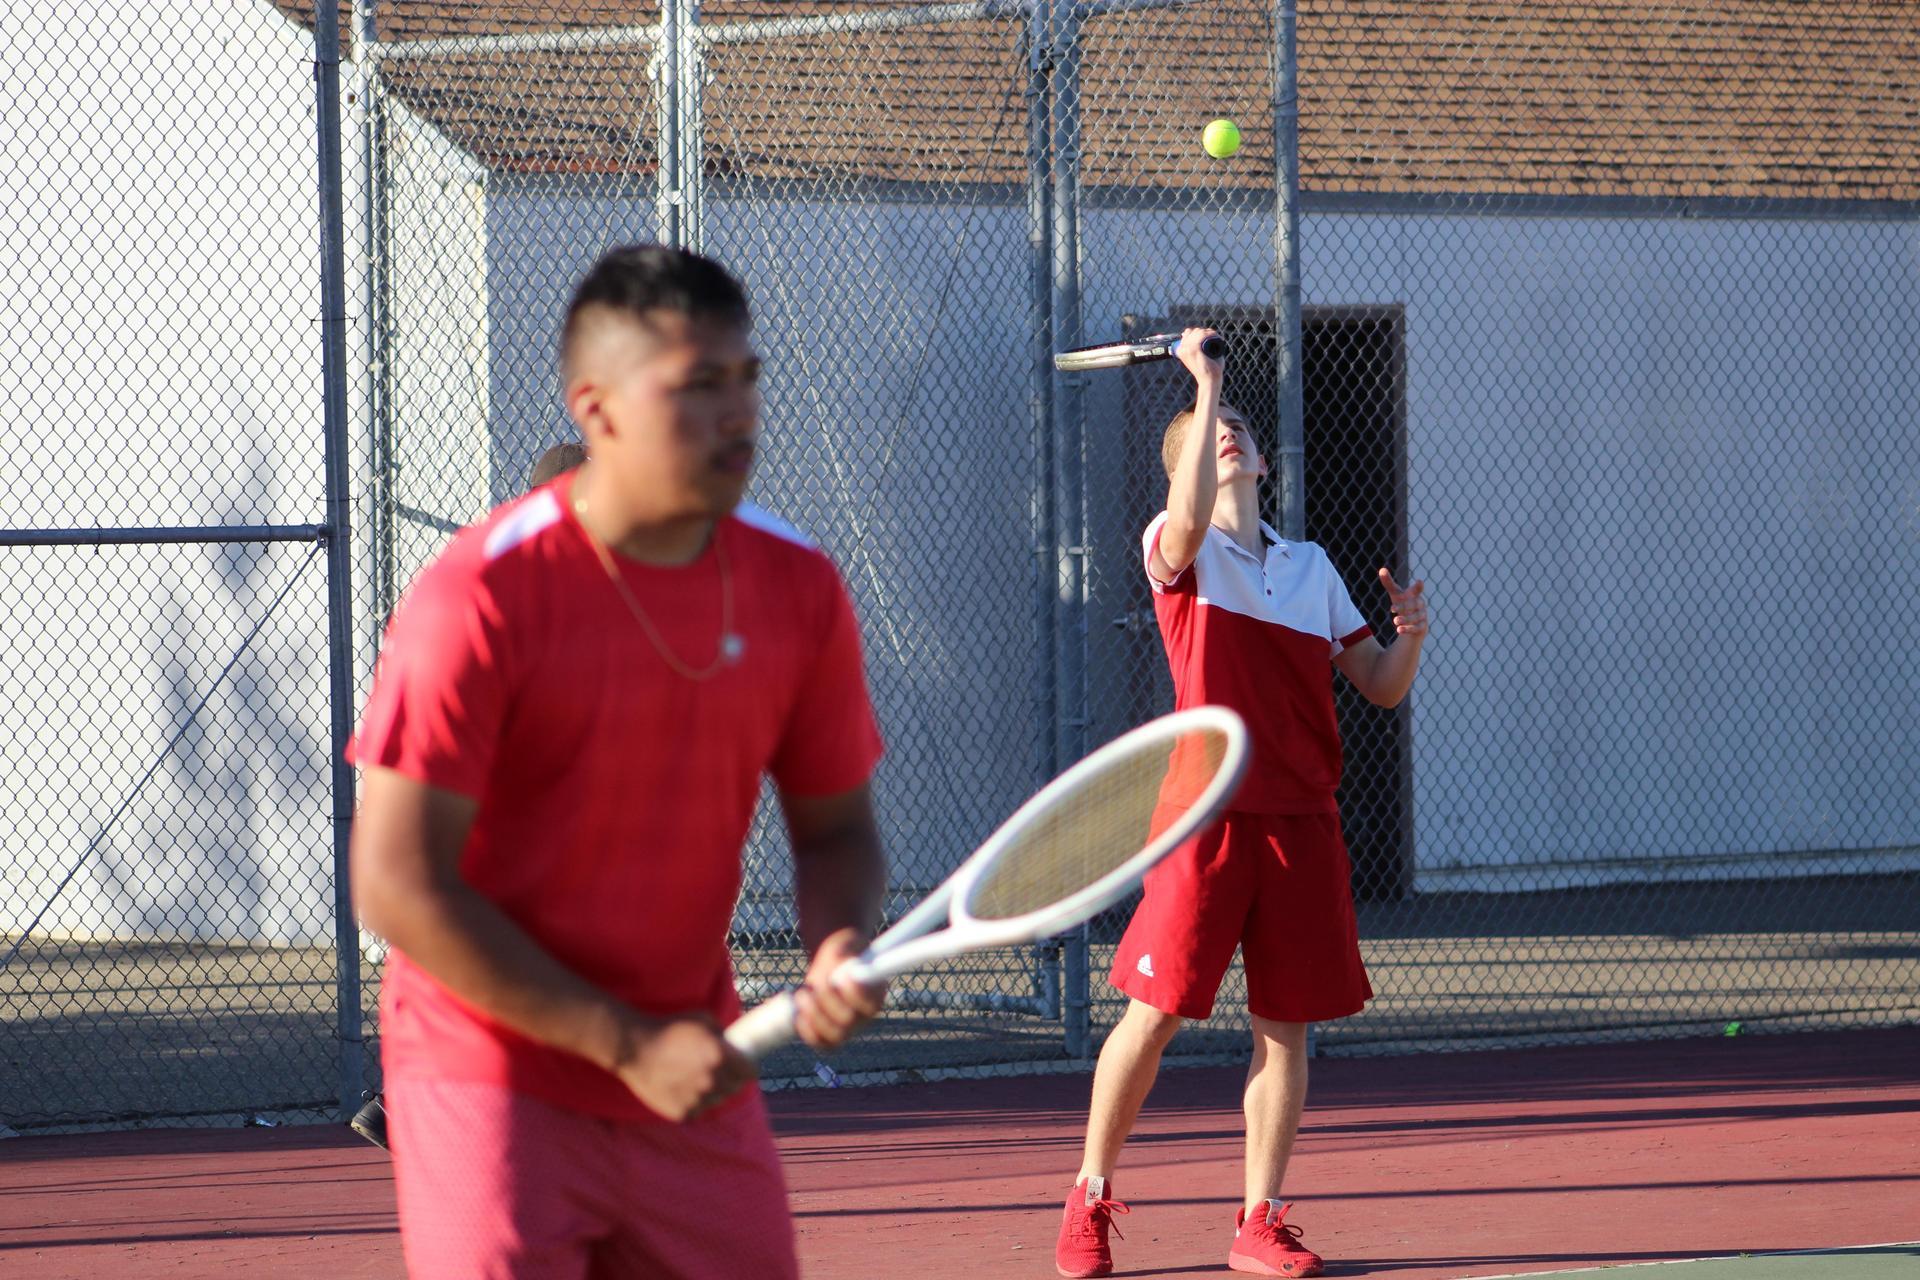 Boys playing tennis against Yosemite